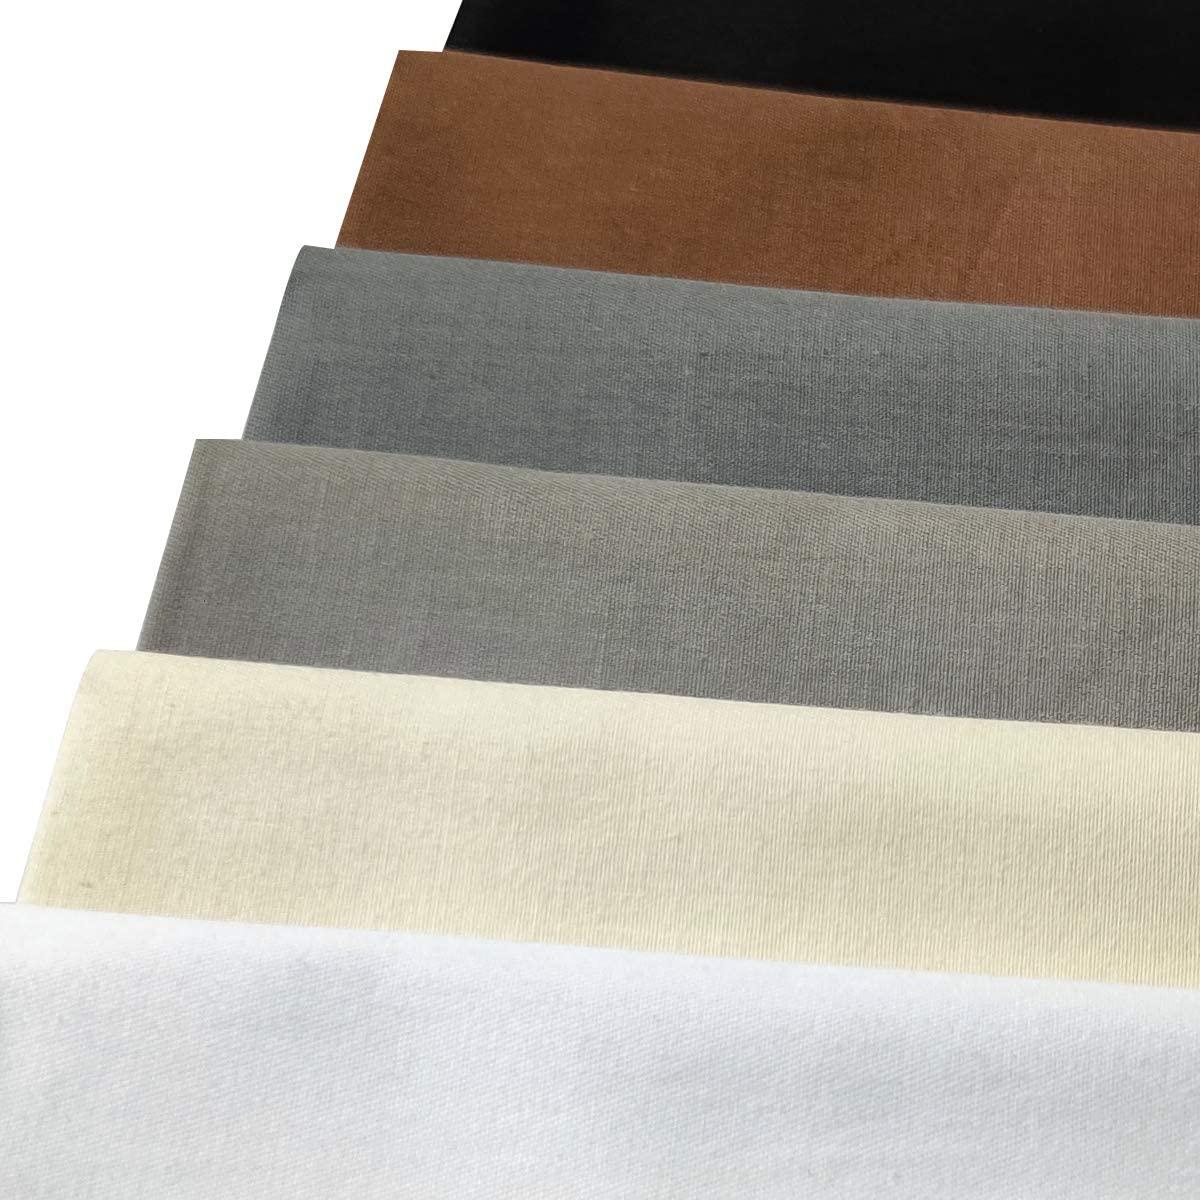 Misscrafts 7pcs Quilting Fabric 100% Cotton Craft Fabric Bundle Squares Fat Quarters 18